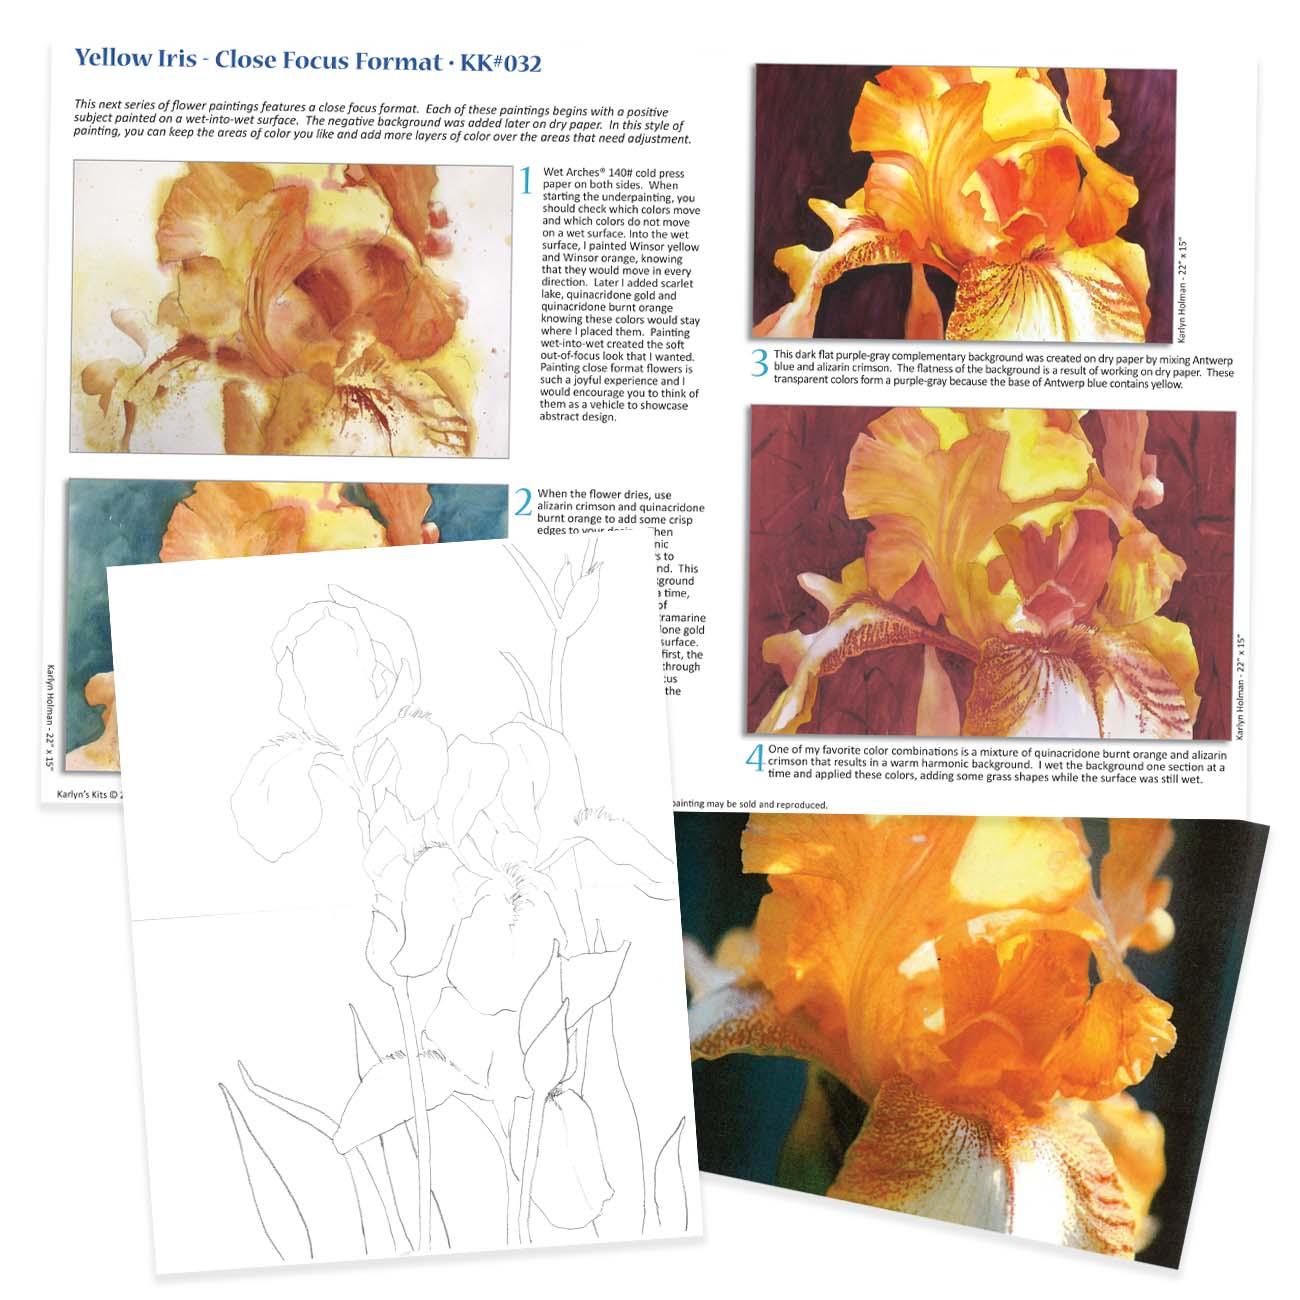 KK032 - Yellow Iris, Close Focus